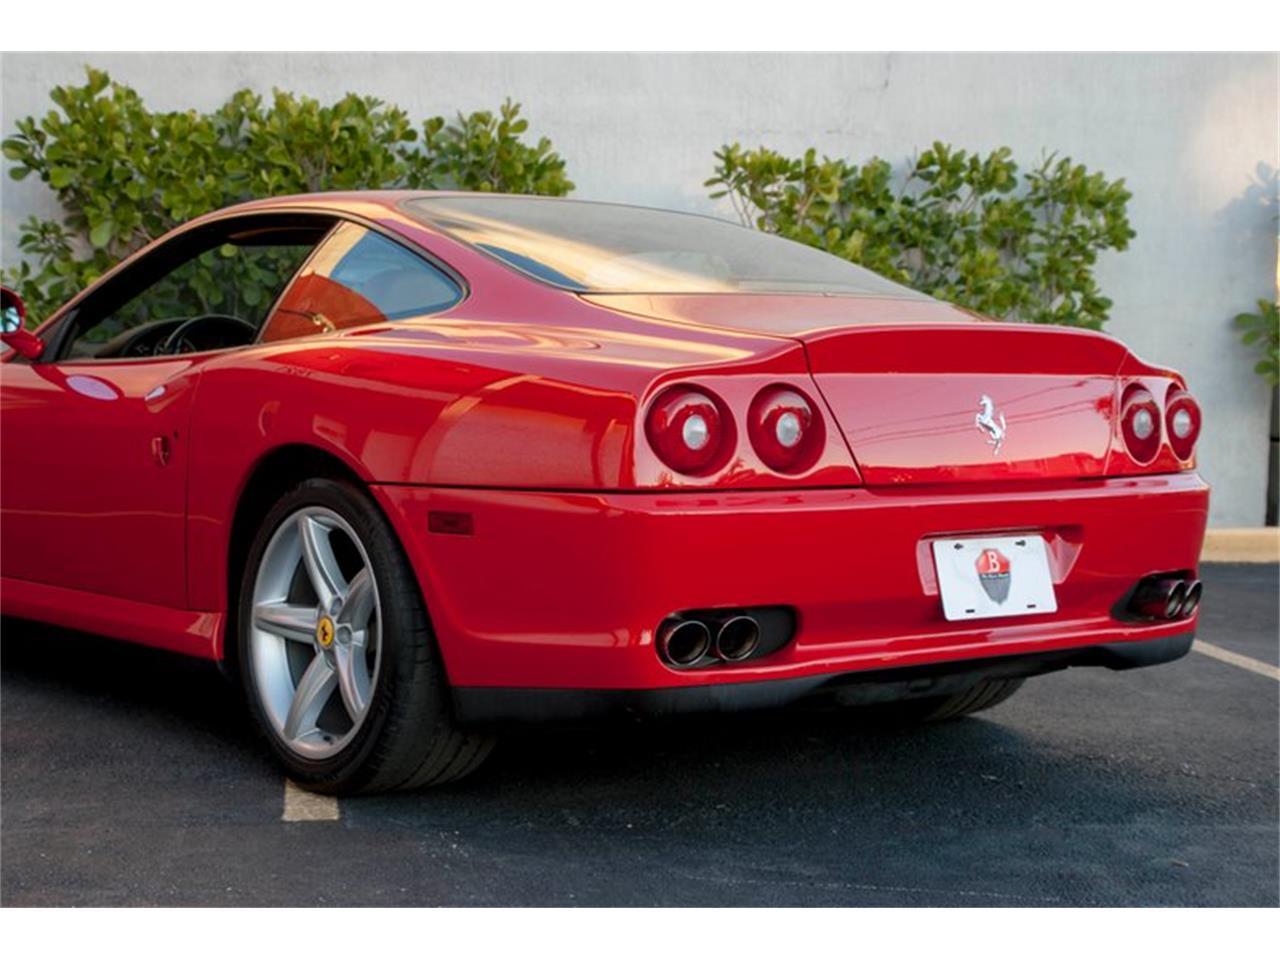 Large Picture of '02 Ferrari 575 located in Florida - $99,900.00 - QN0J